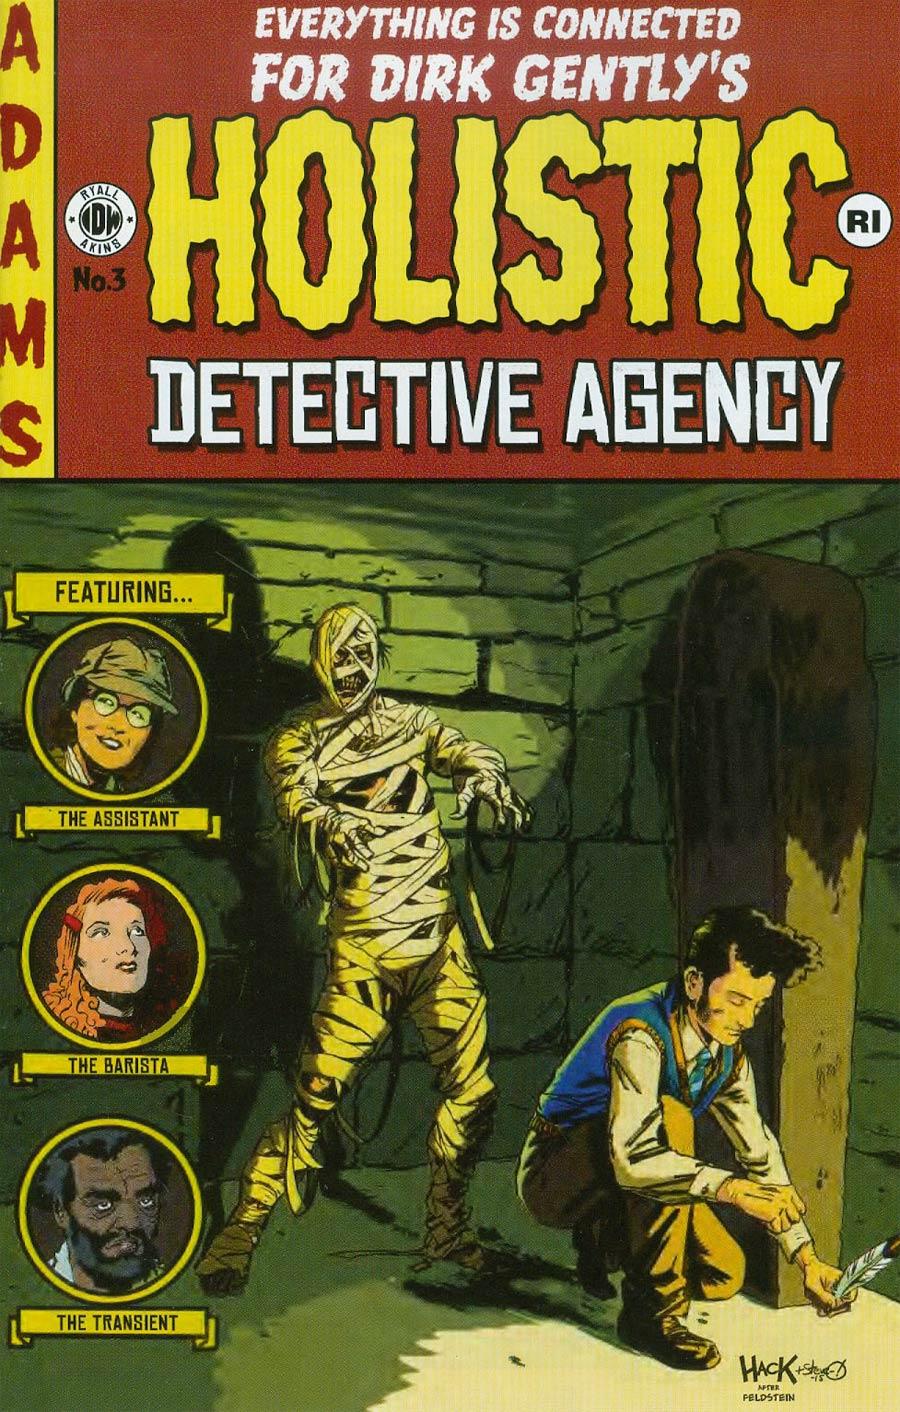 Dirk Gentlys Holistic Detective Agency #3 Cover C Incentive Robert Hack EC Comics Variant Cover